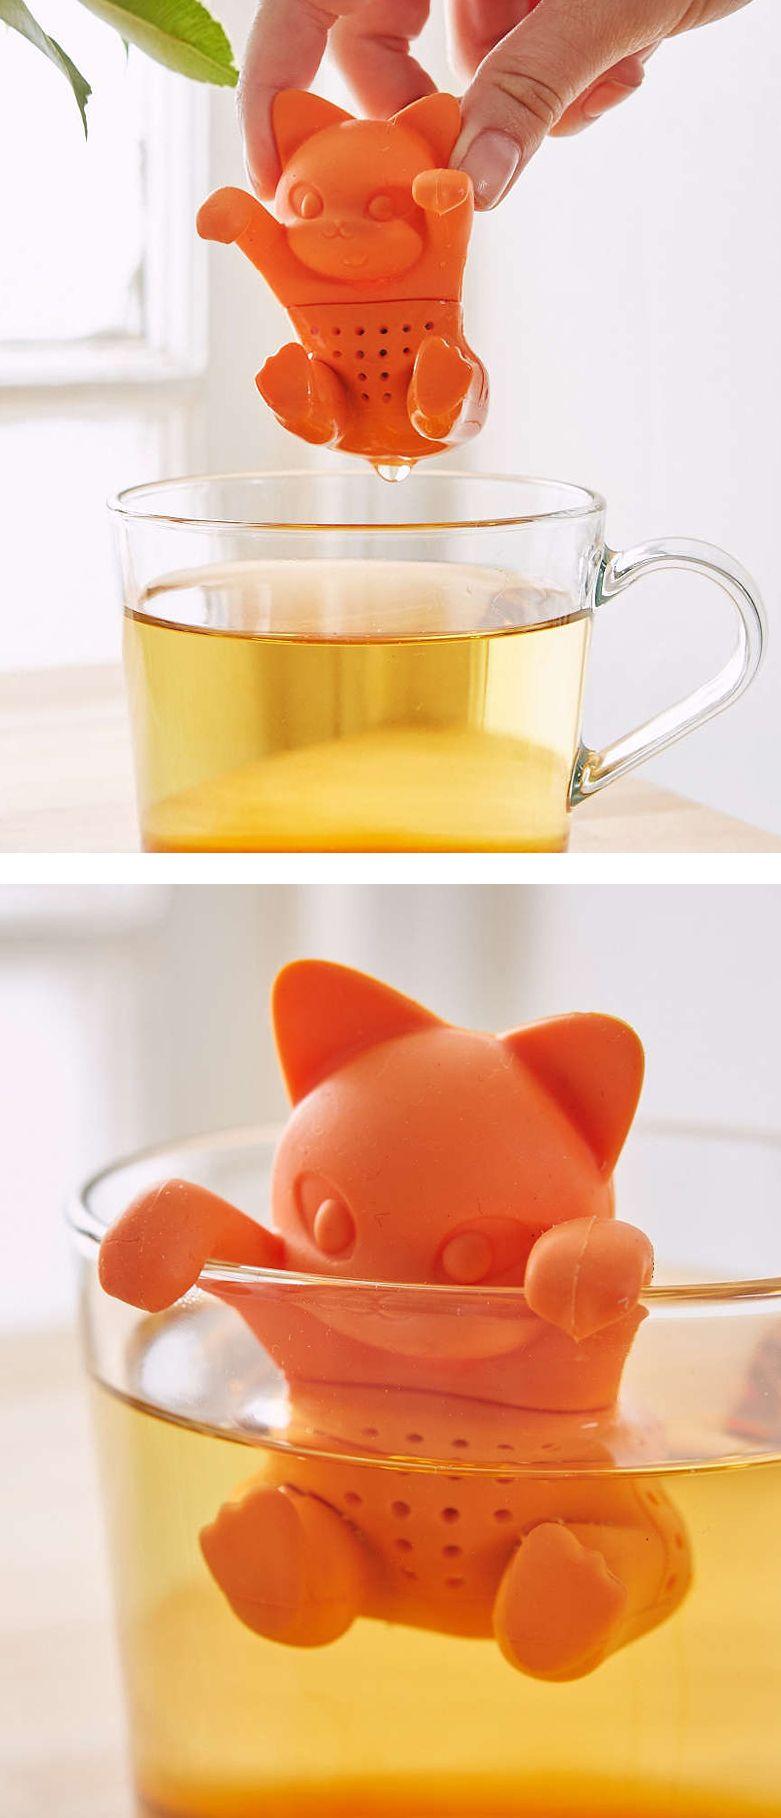 Kit-Tea infuser | Kitchen Queen | Pinterest | My life, The list ...